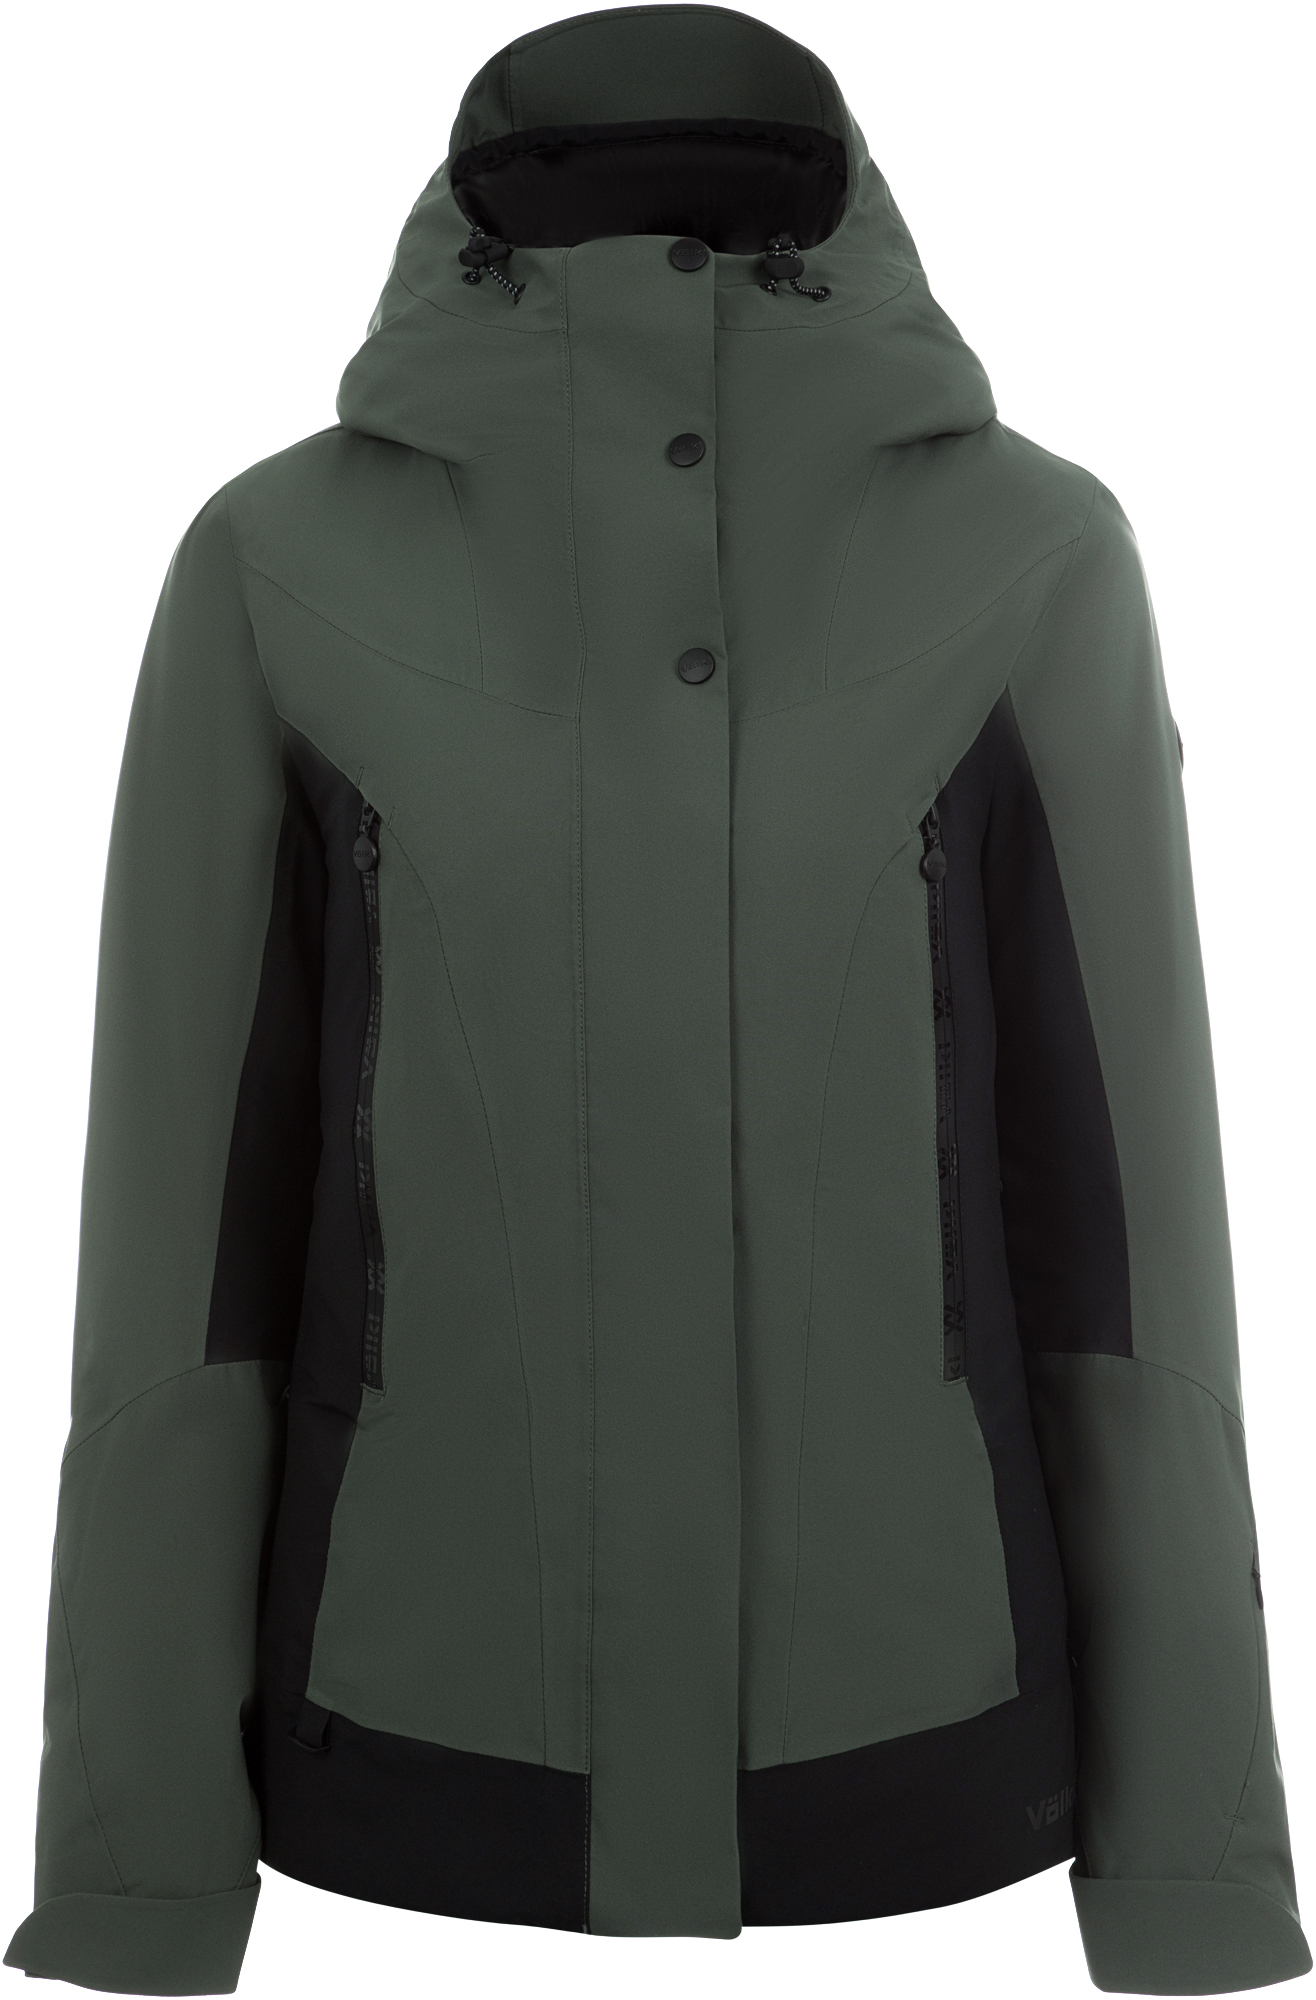 цена Volkl Куртка утепленная женская Volkl, размер 46 онлайн в 2017 году